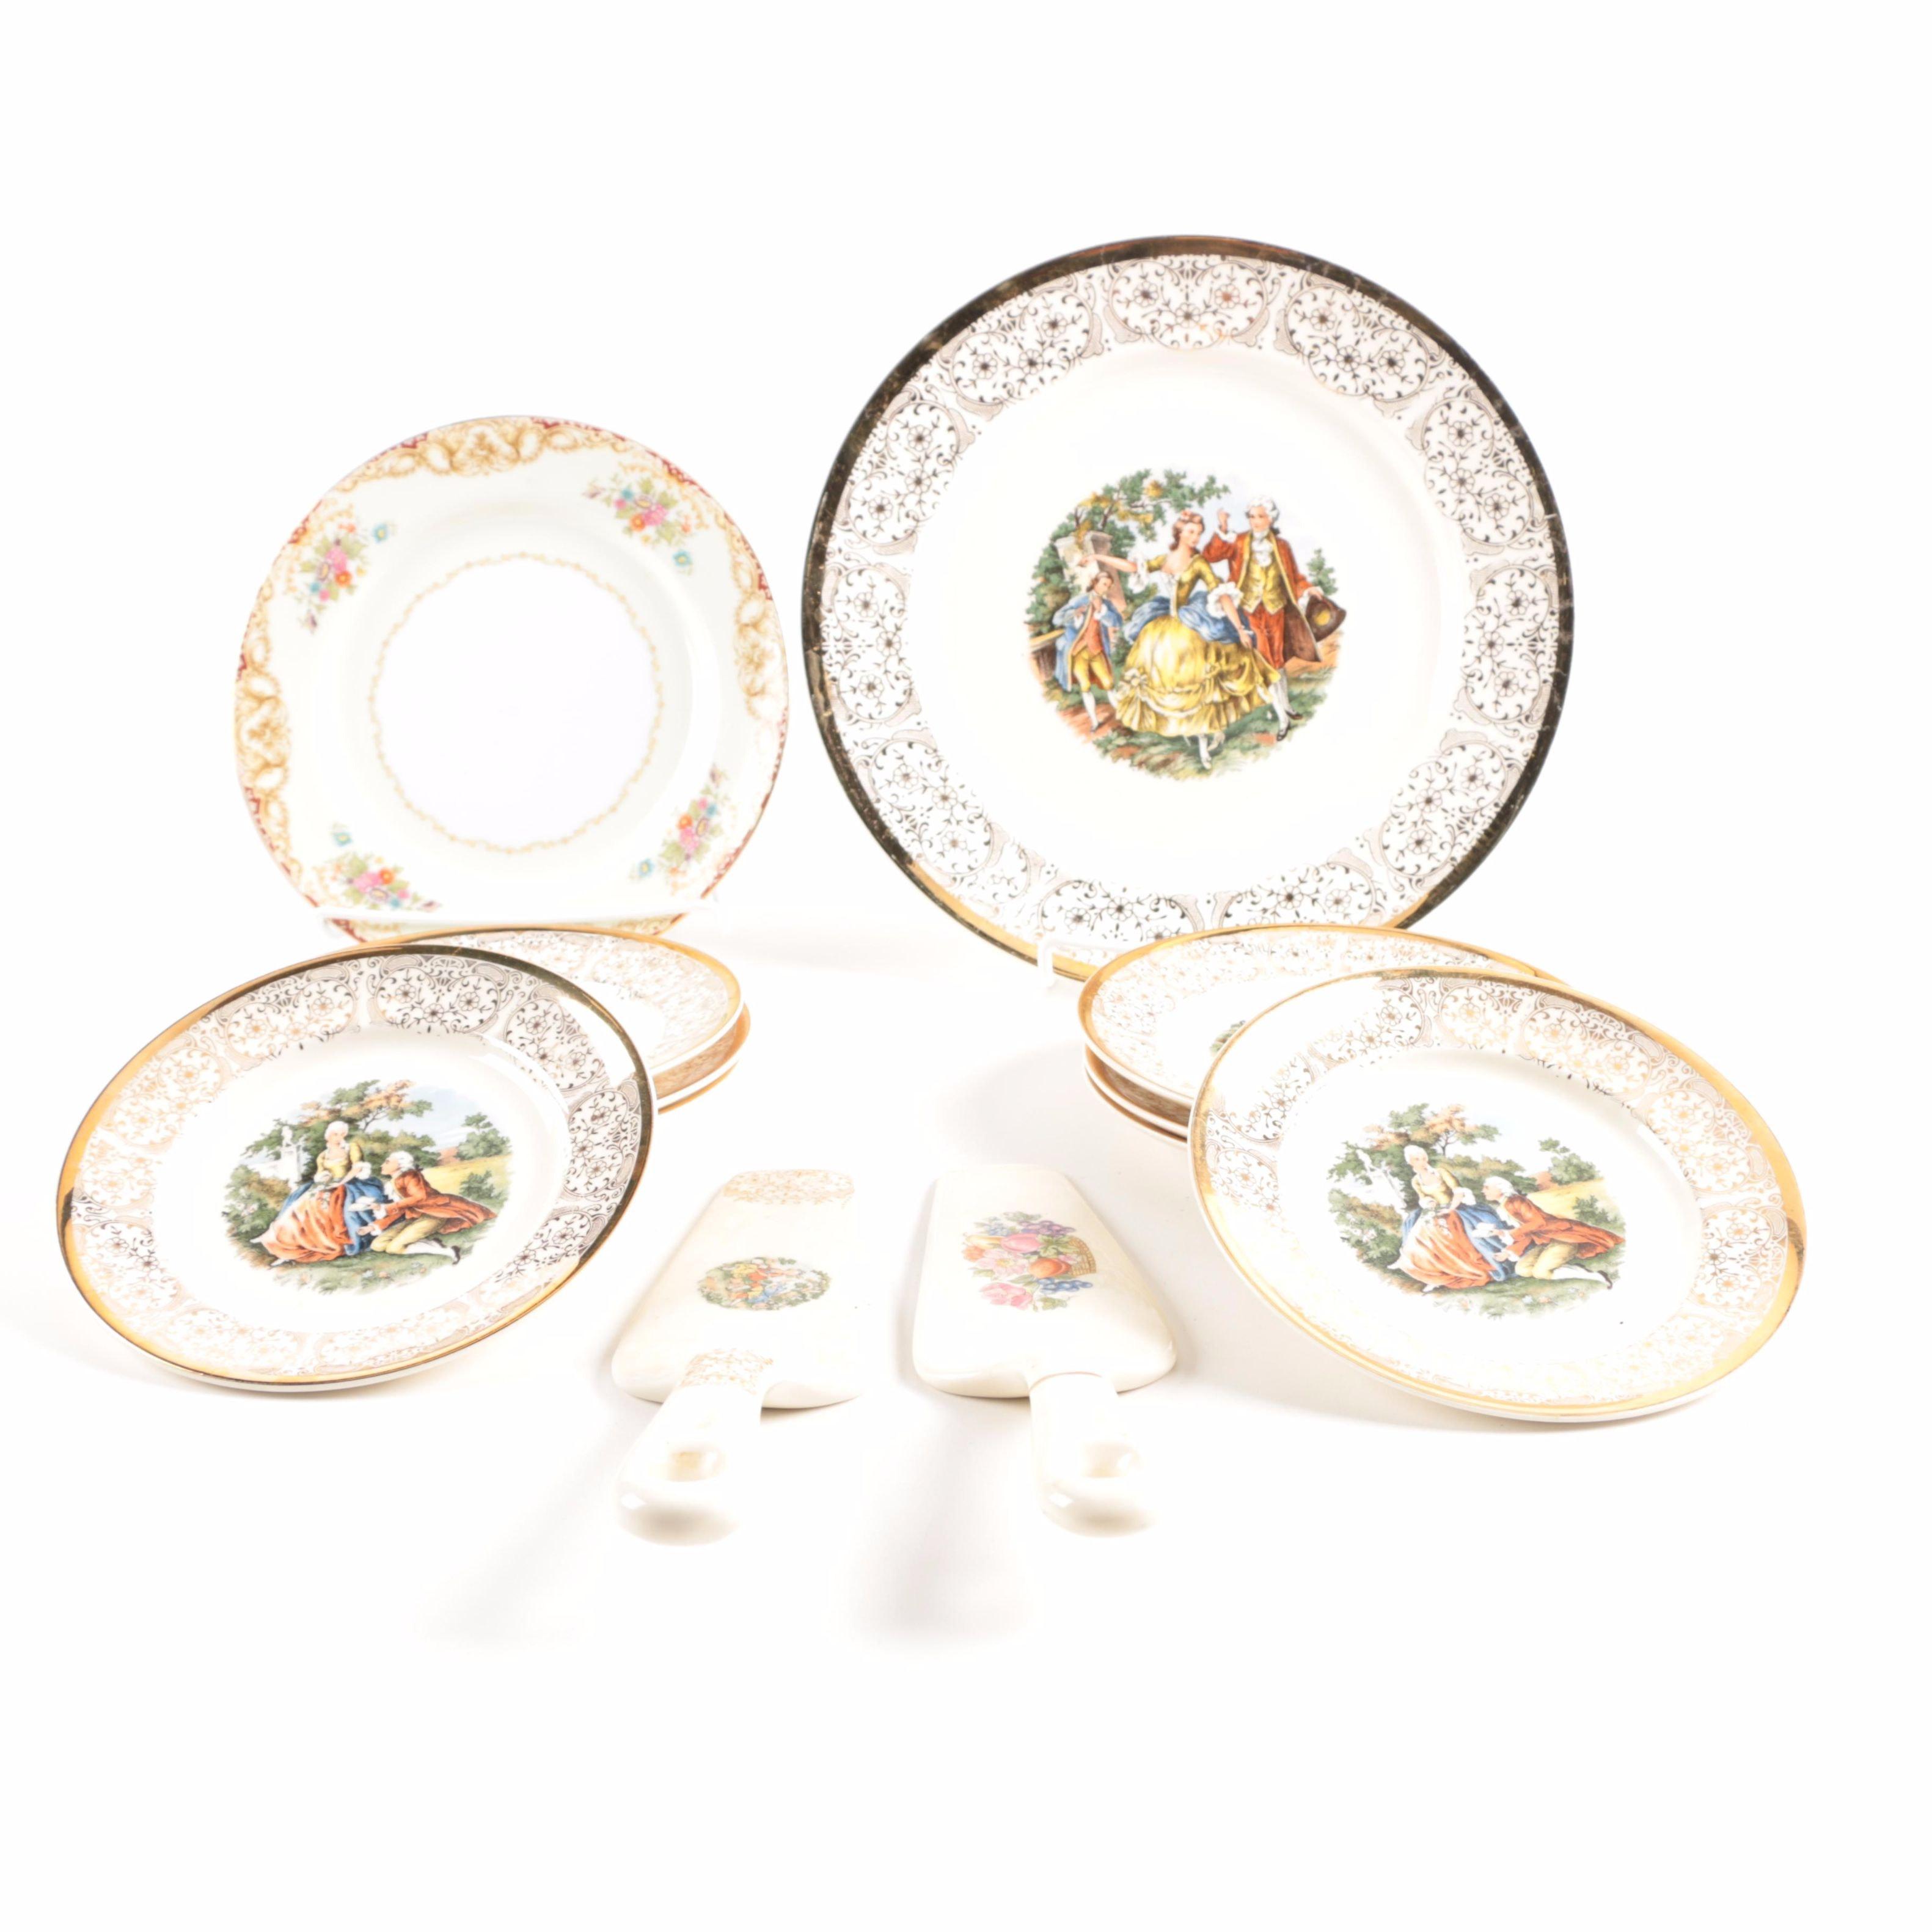 Decorative Ceramic and Porcelain Including Noritake